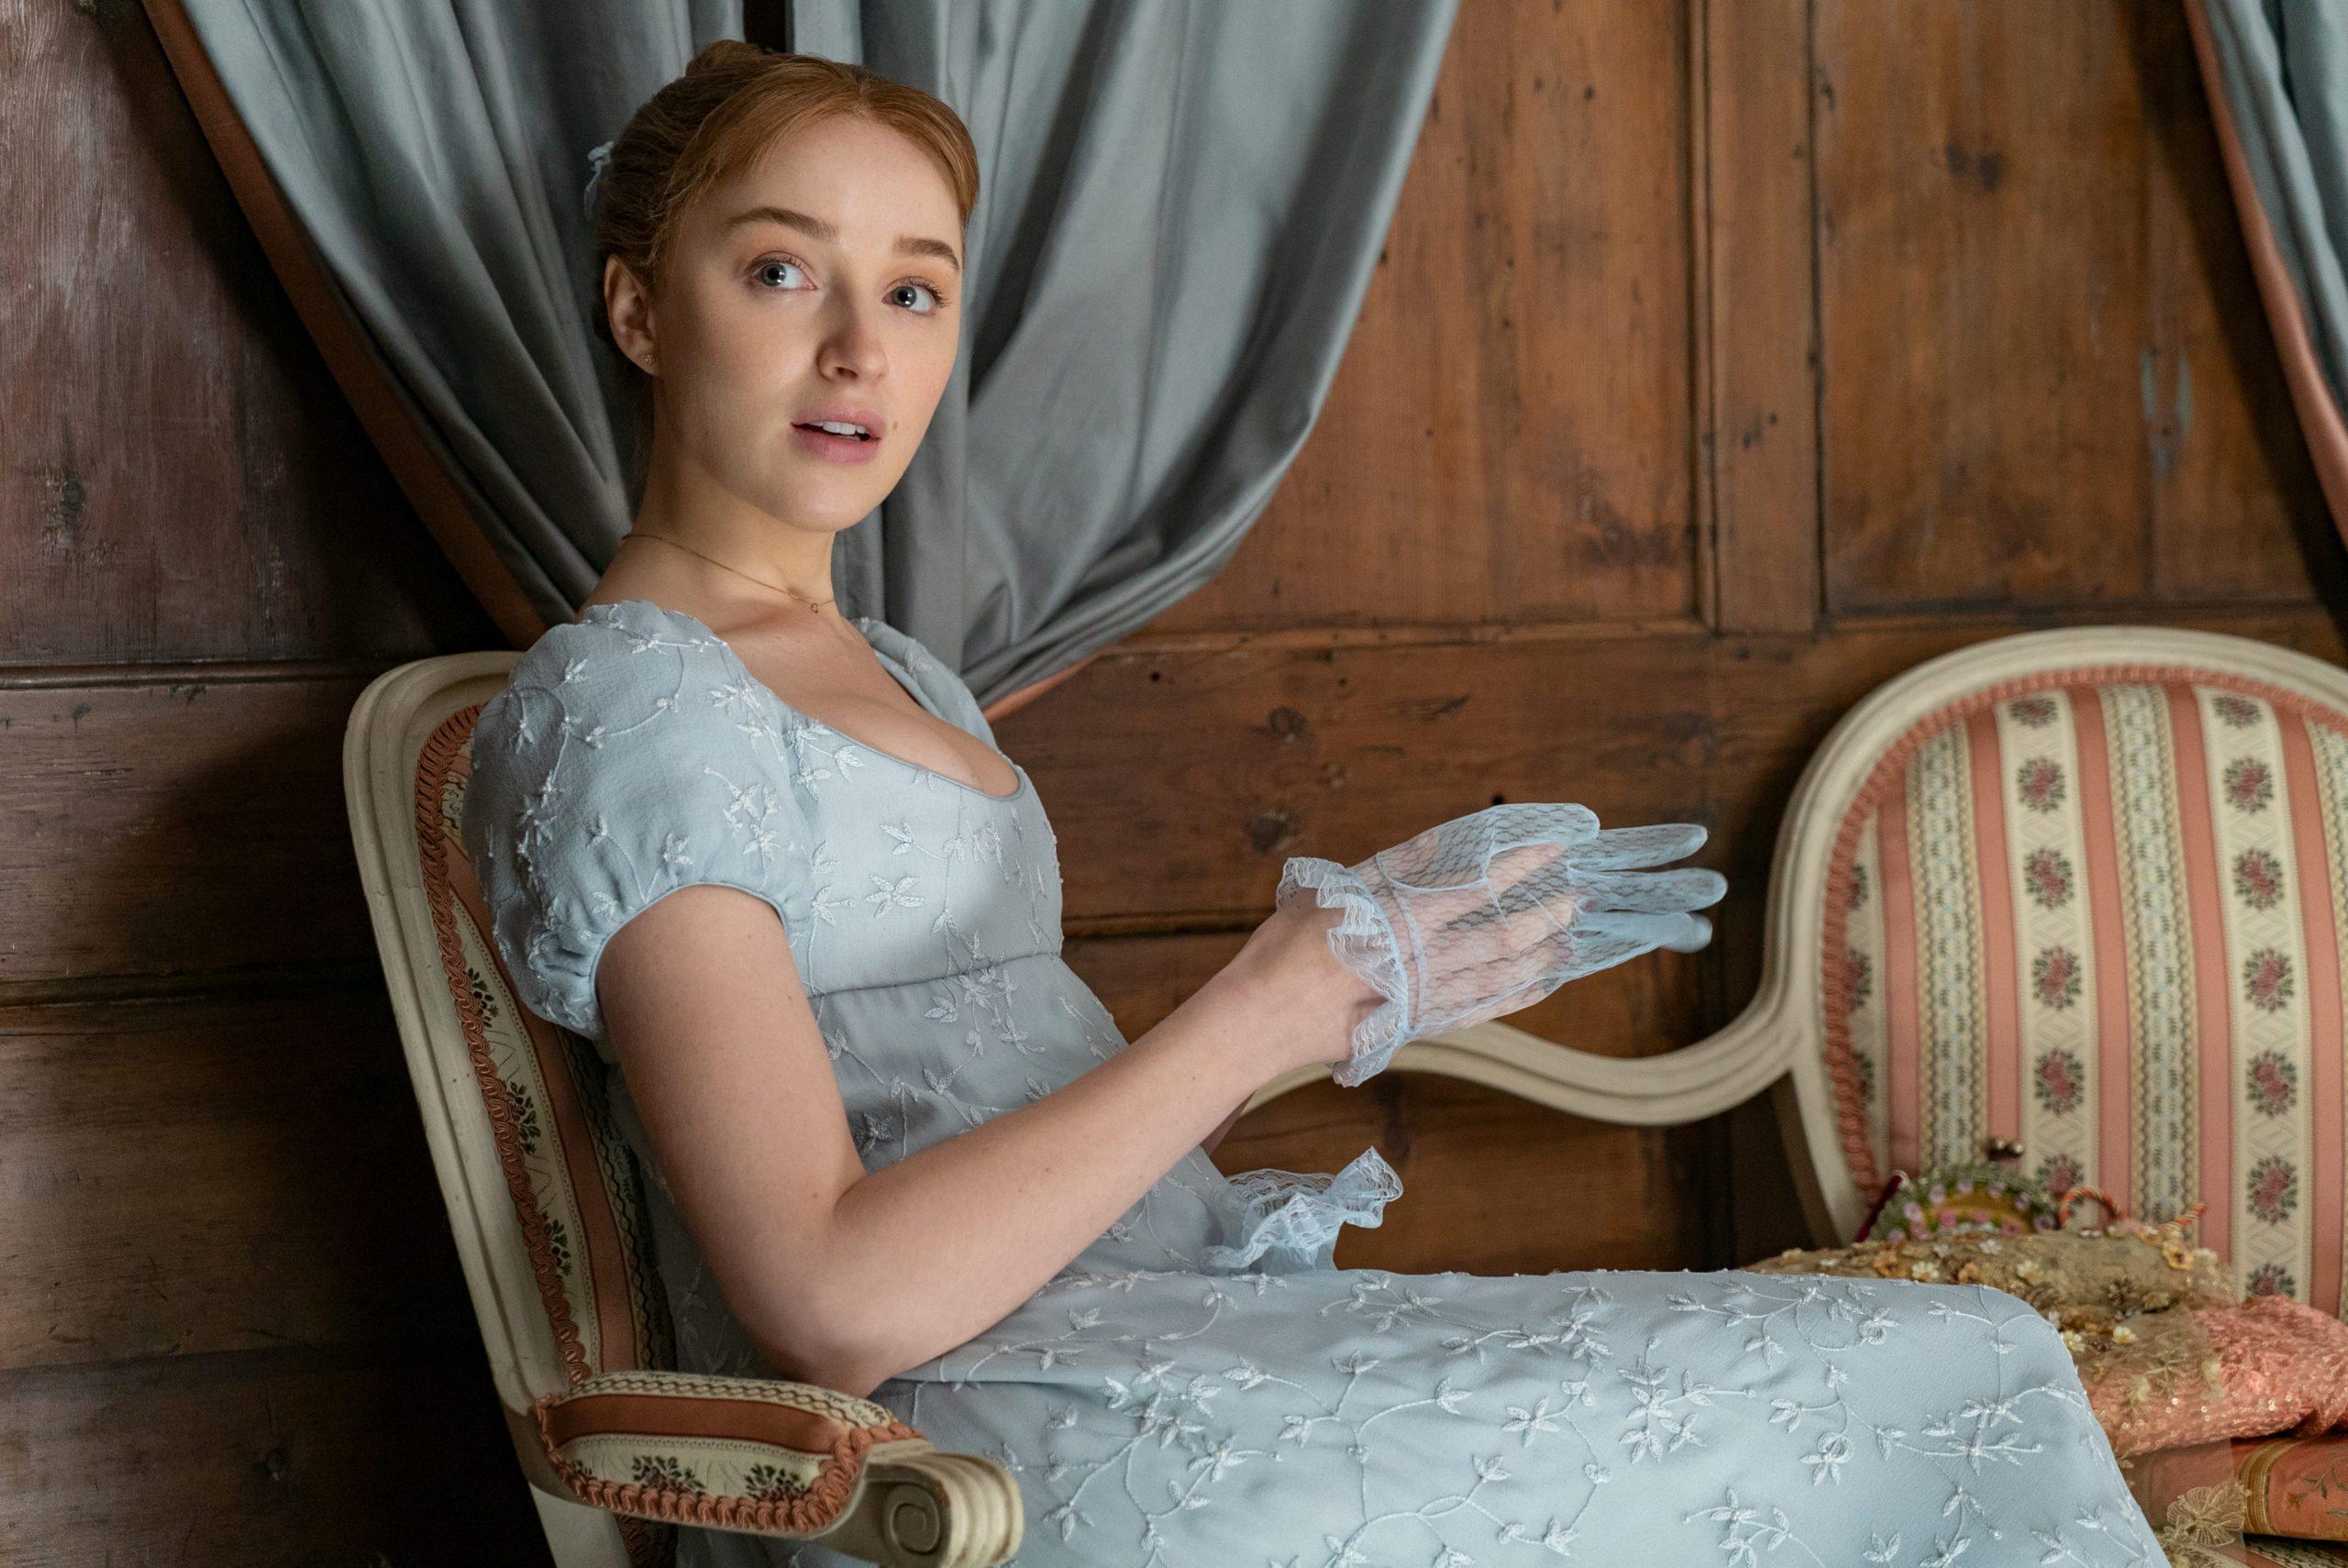 Daphne Bridgerton in the Netflix show Bridgerton